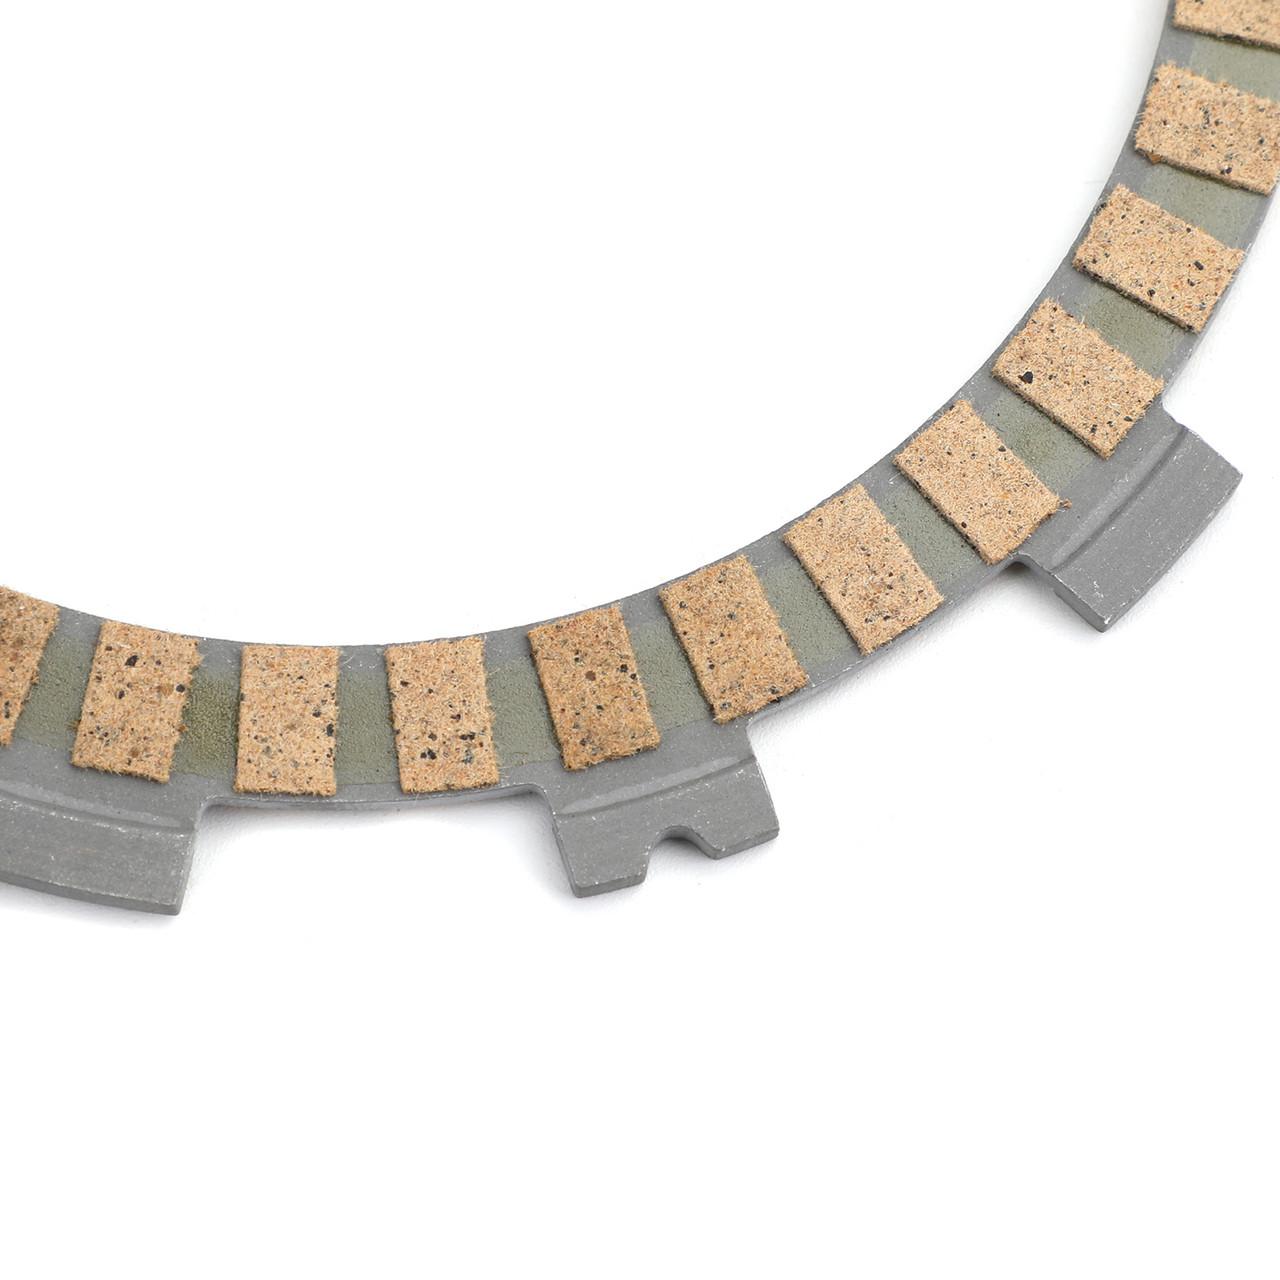 Clutch Plate Kit Fit For Suzuki RM80 B/C/N/XT/XX 78-81 XE/XF/HF 84-85 RM85 K2/LK2/K3/LK3/K4/LK4 00-04 RM85 RM85L 03-15